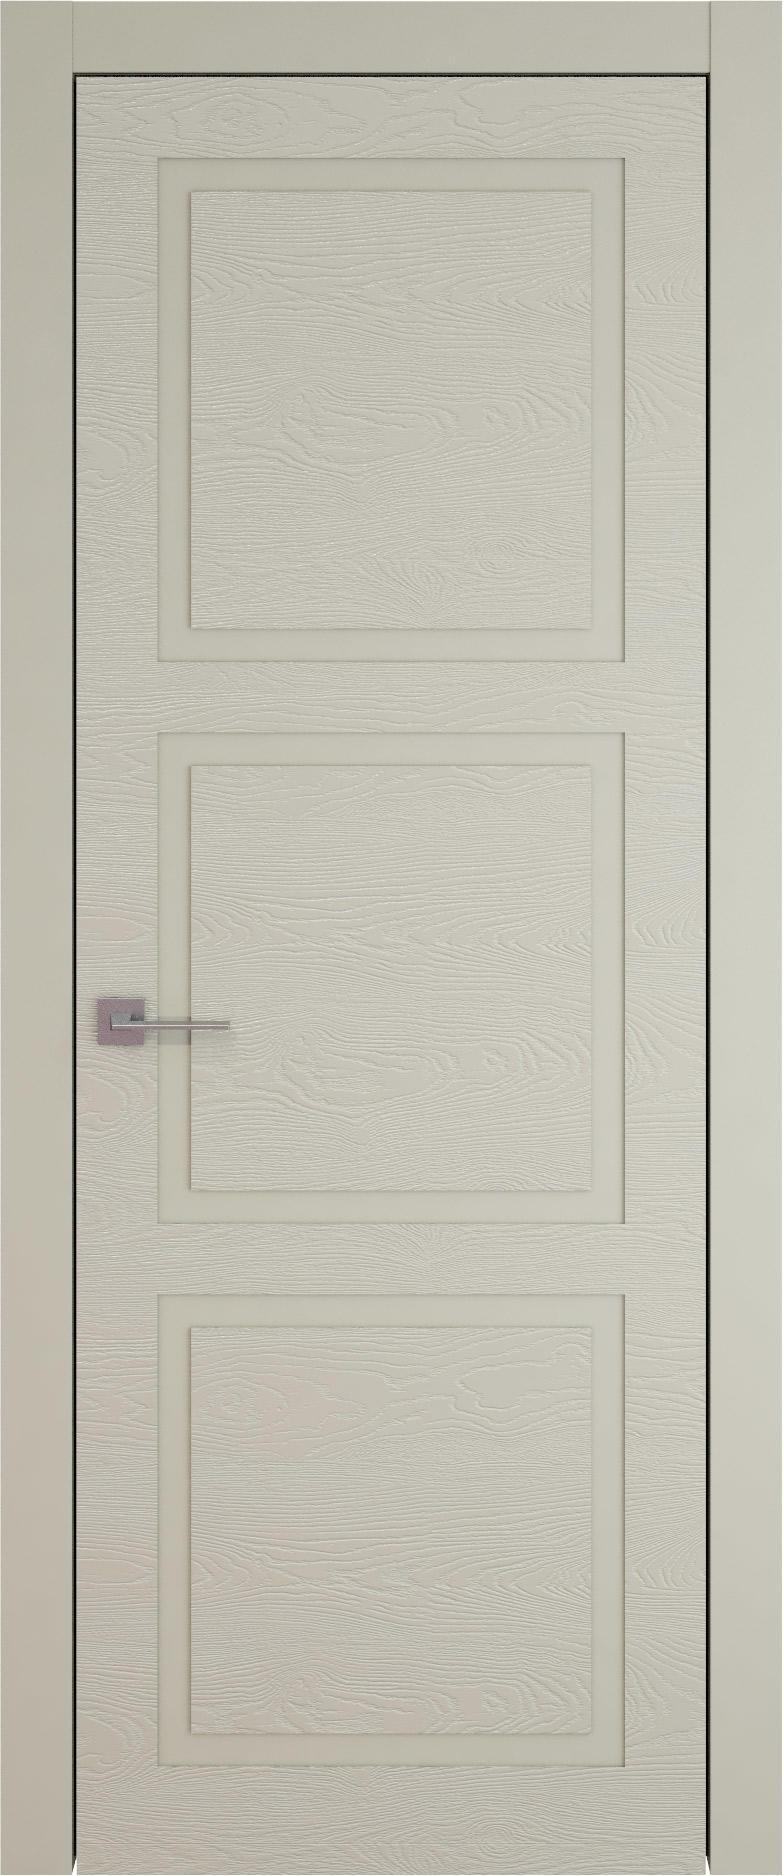 Tivoli Л-5 цвет - Серо-оливковая эмаль по шпону (RAL 7032) Без стекла (ДГ)